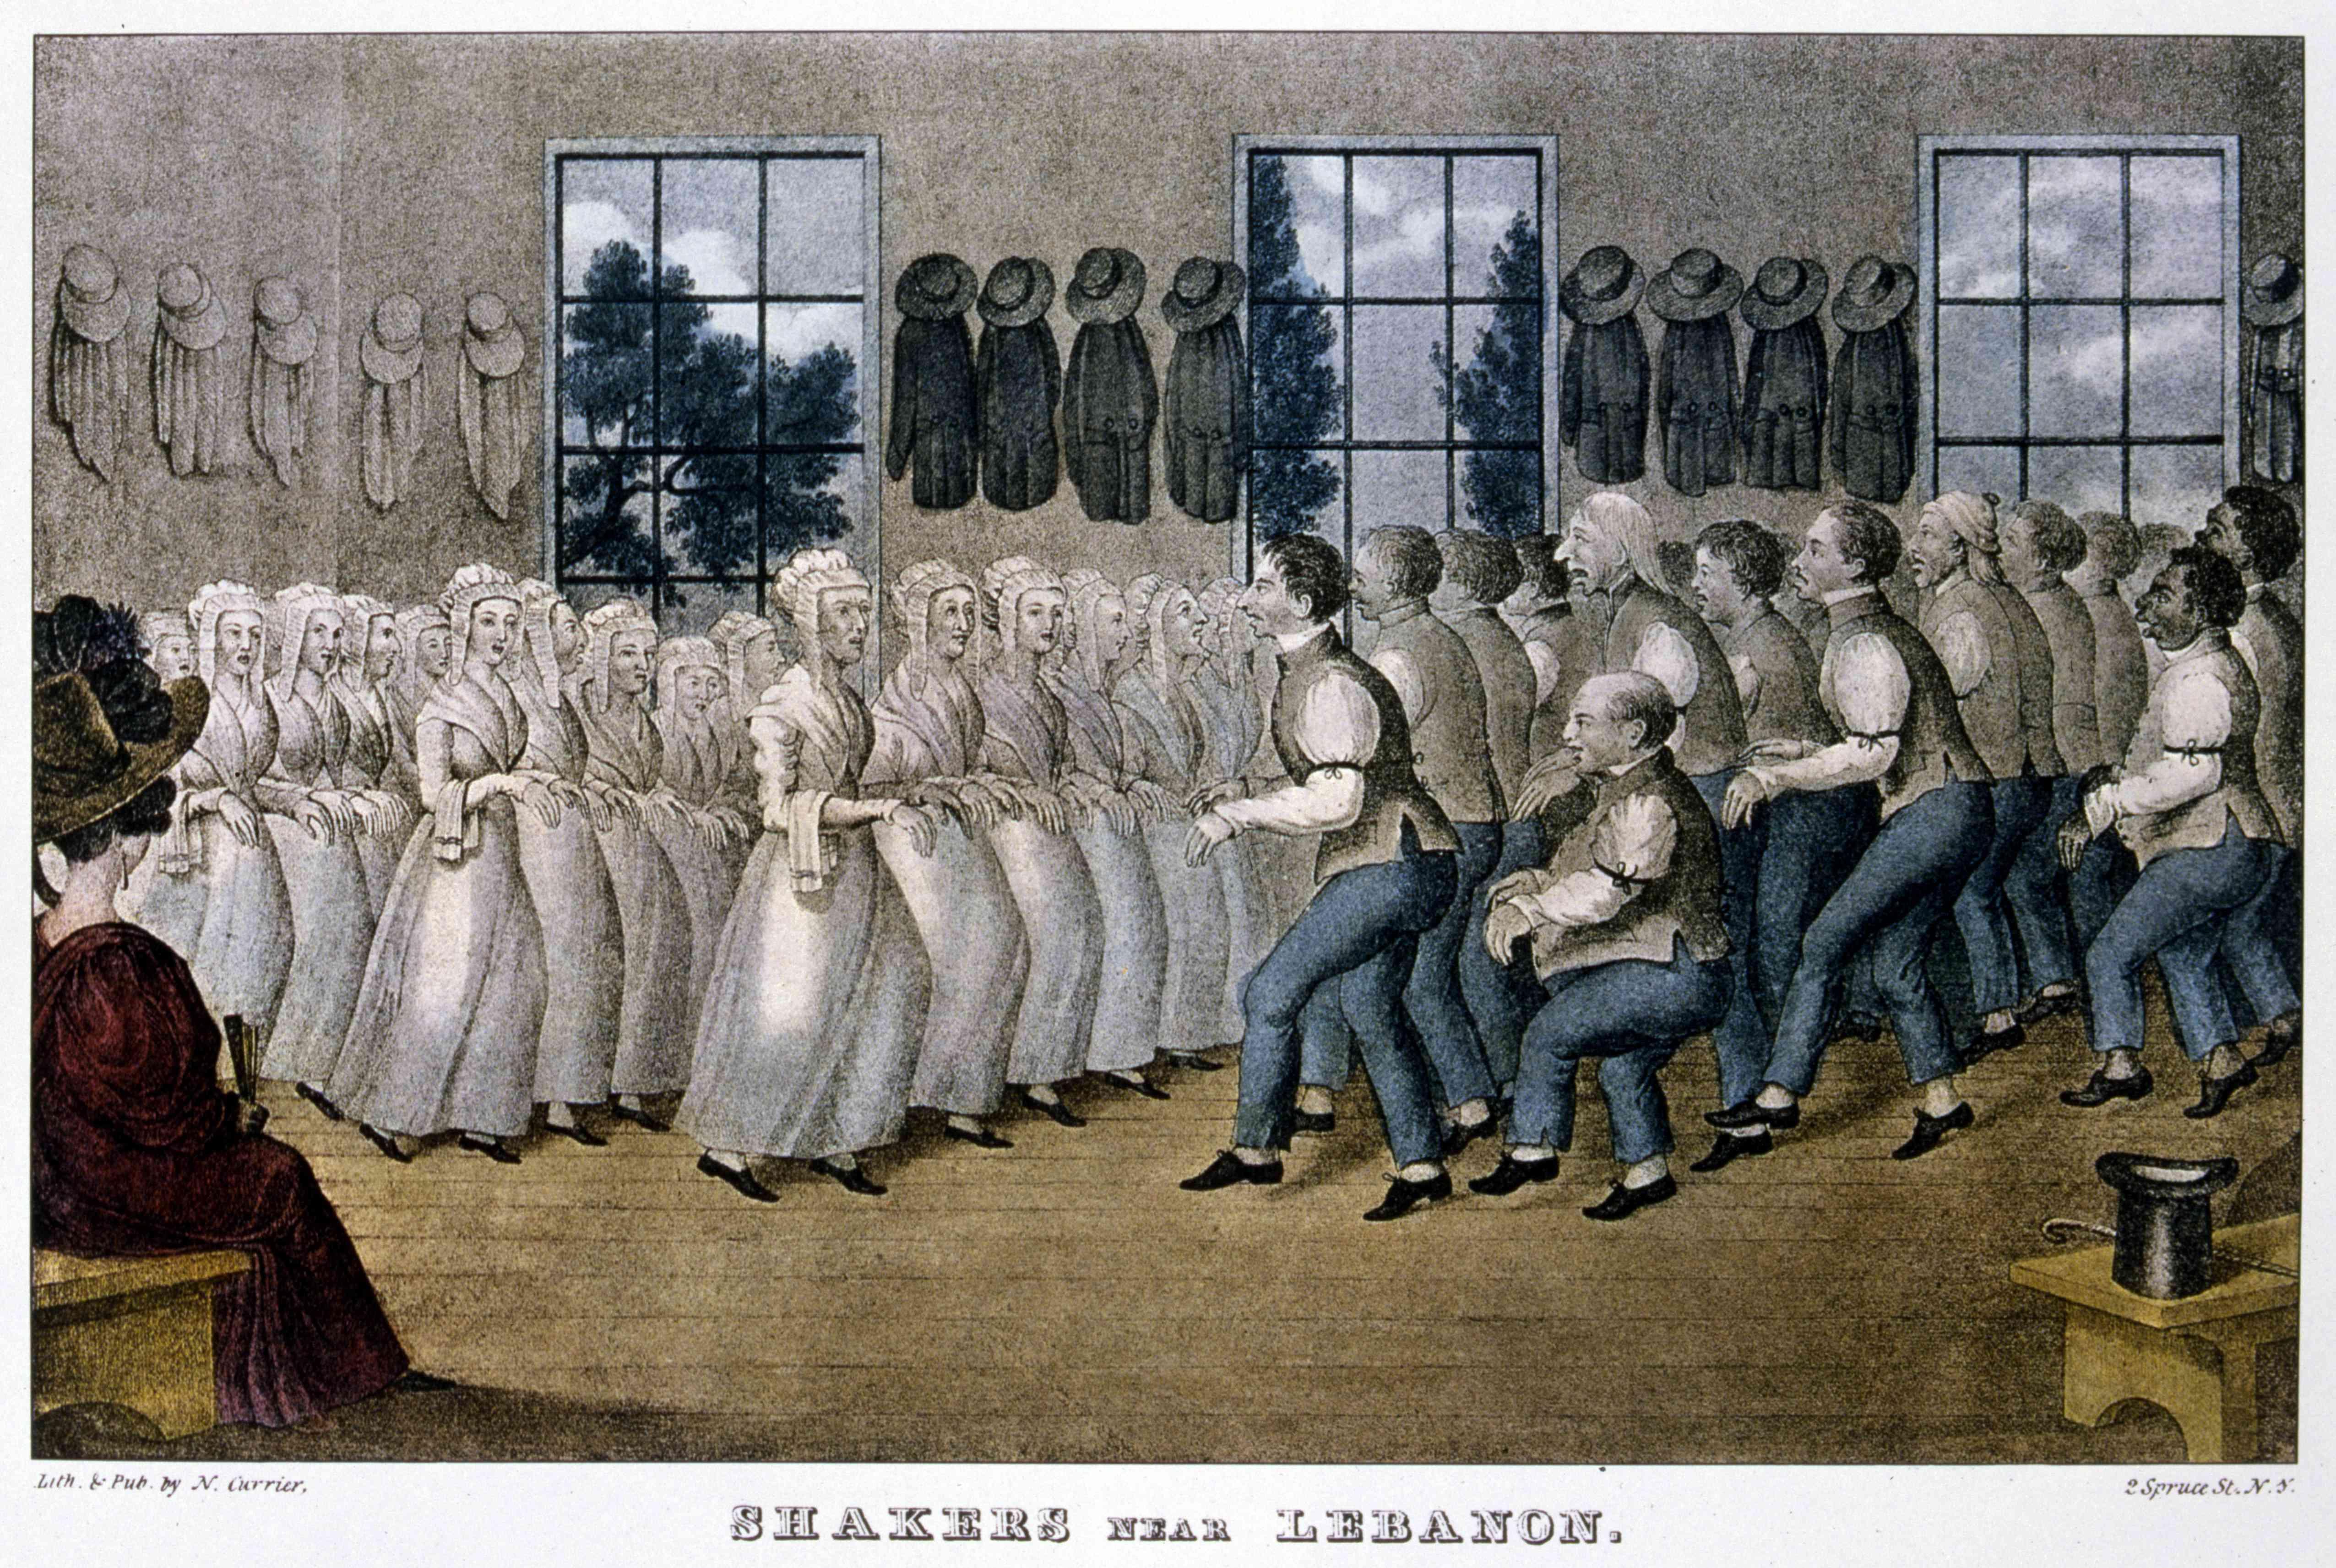 'Shakers near Lebanon', c1870